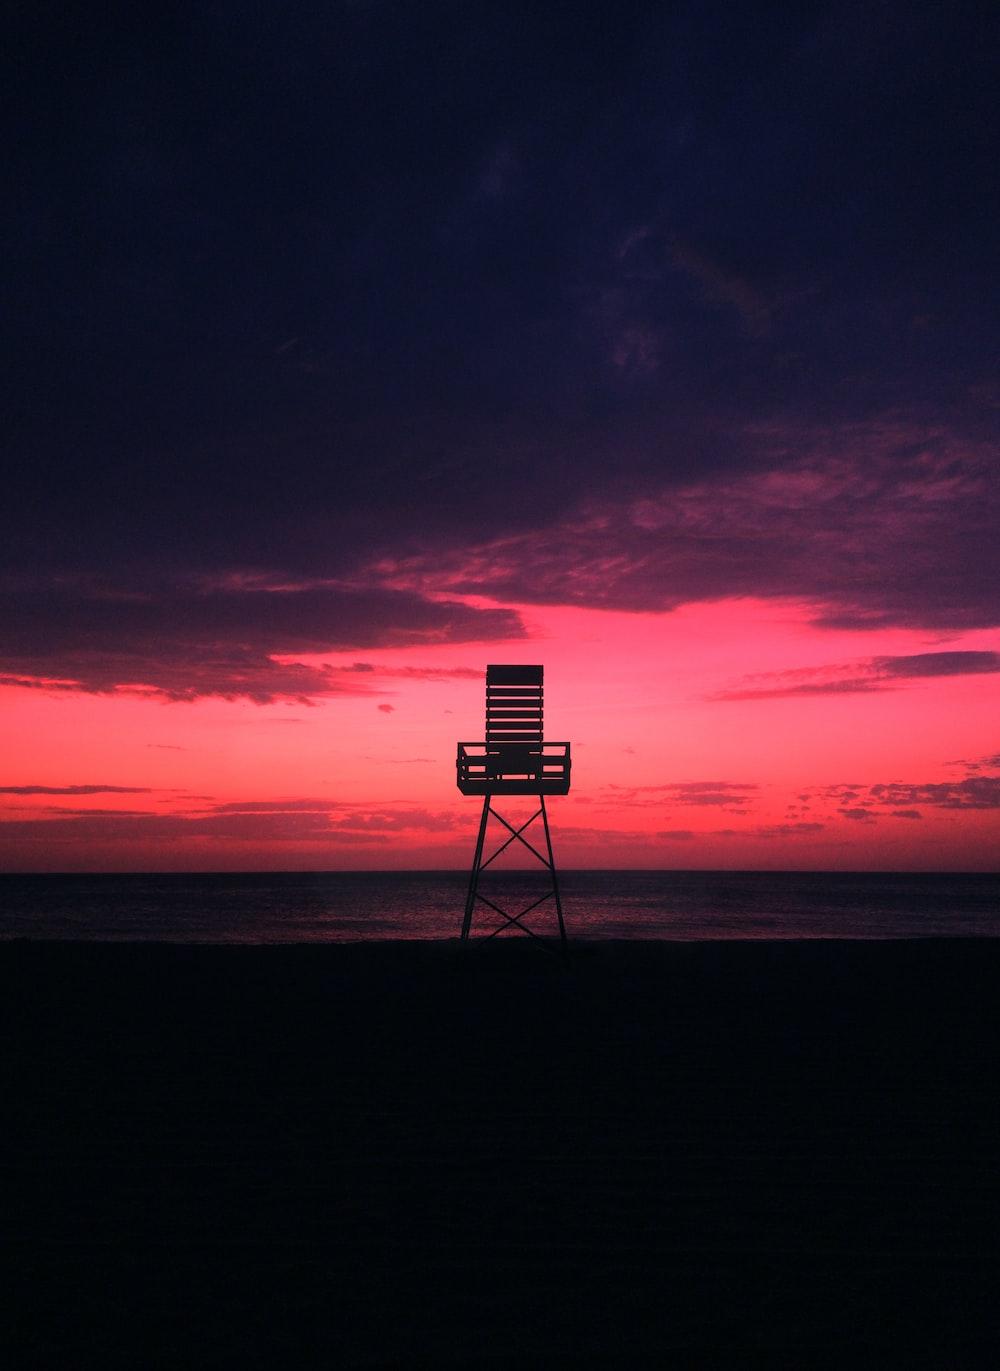 brown watch tower on shore under golden hour